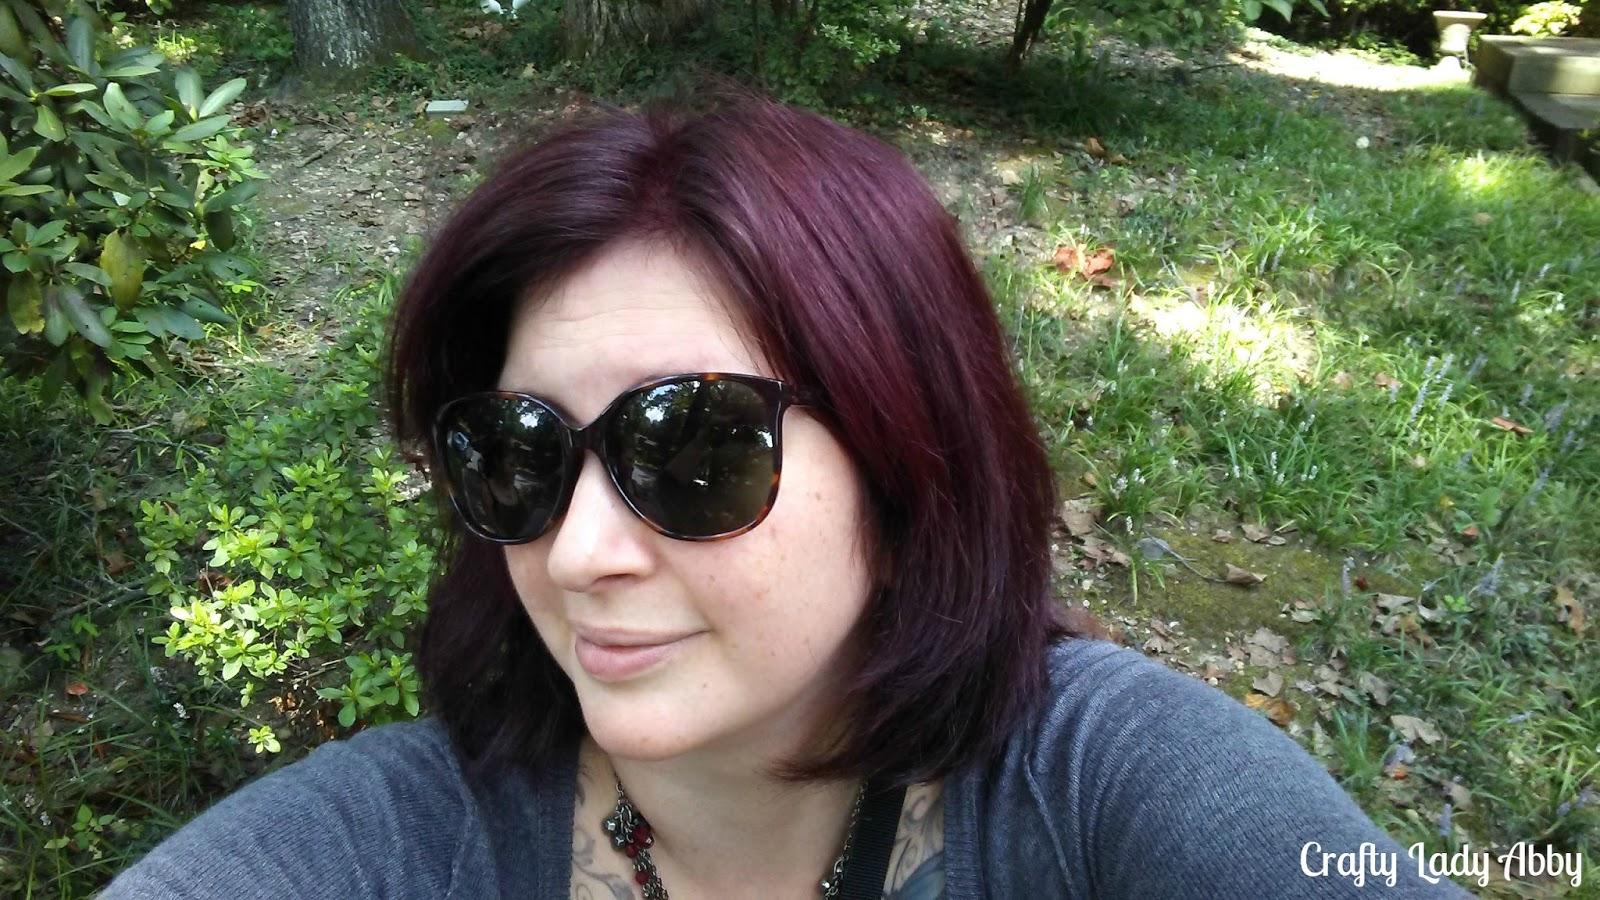 Beauty Garnier Nutrisse In Intense Dark Violet Hair Color Review